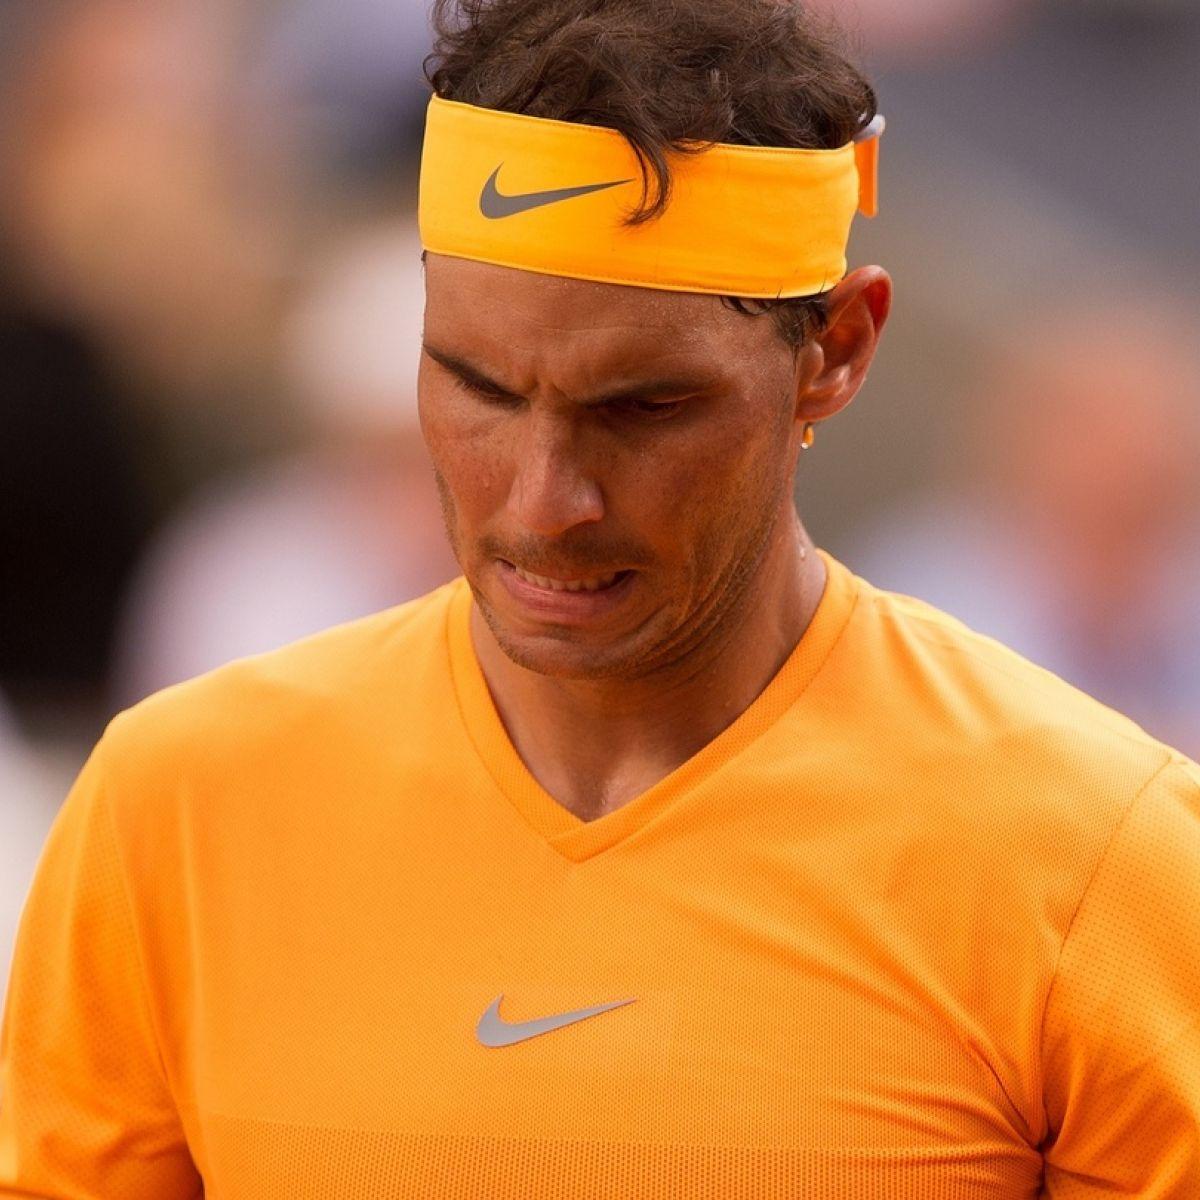 Rafael Nadal Loses His World No 1 Ranking In Madrid